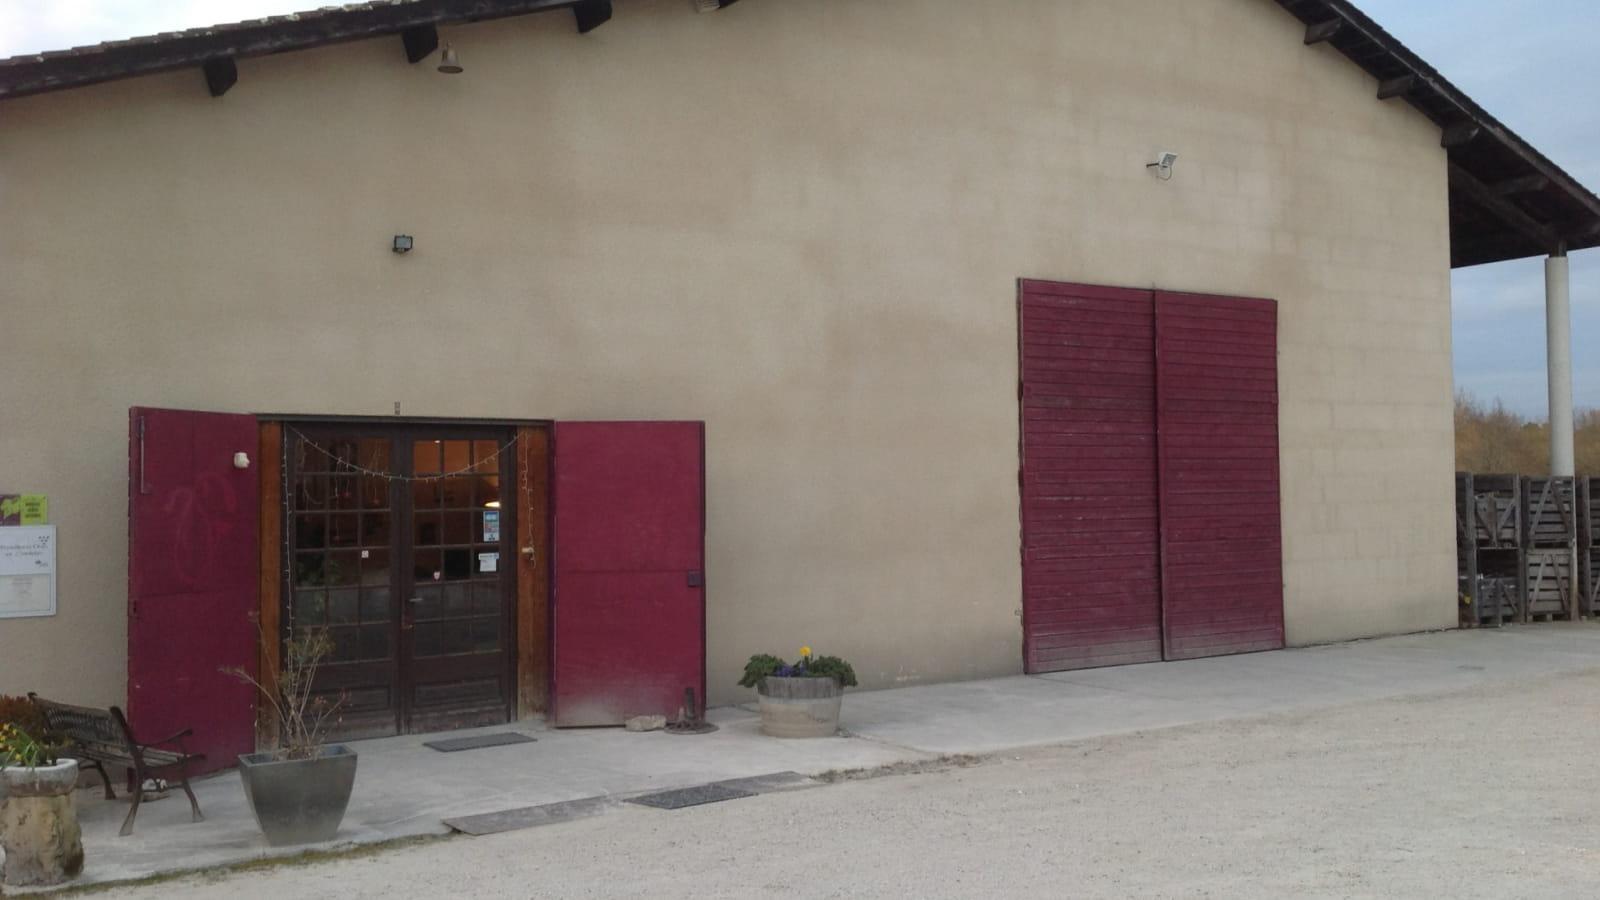 Chateau_Haut_Reys (2)